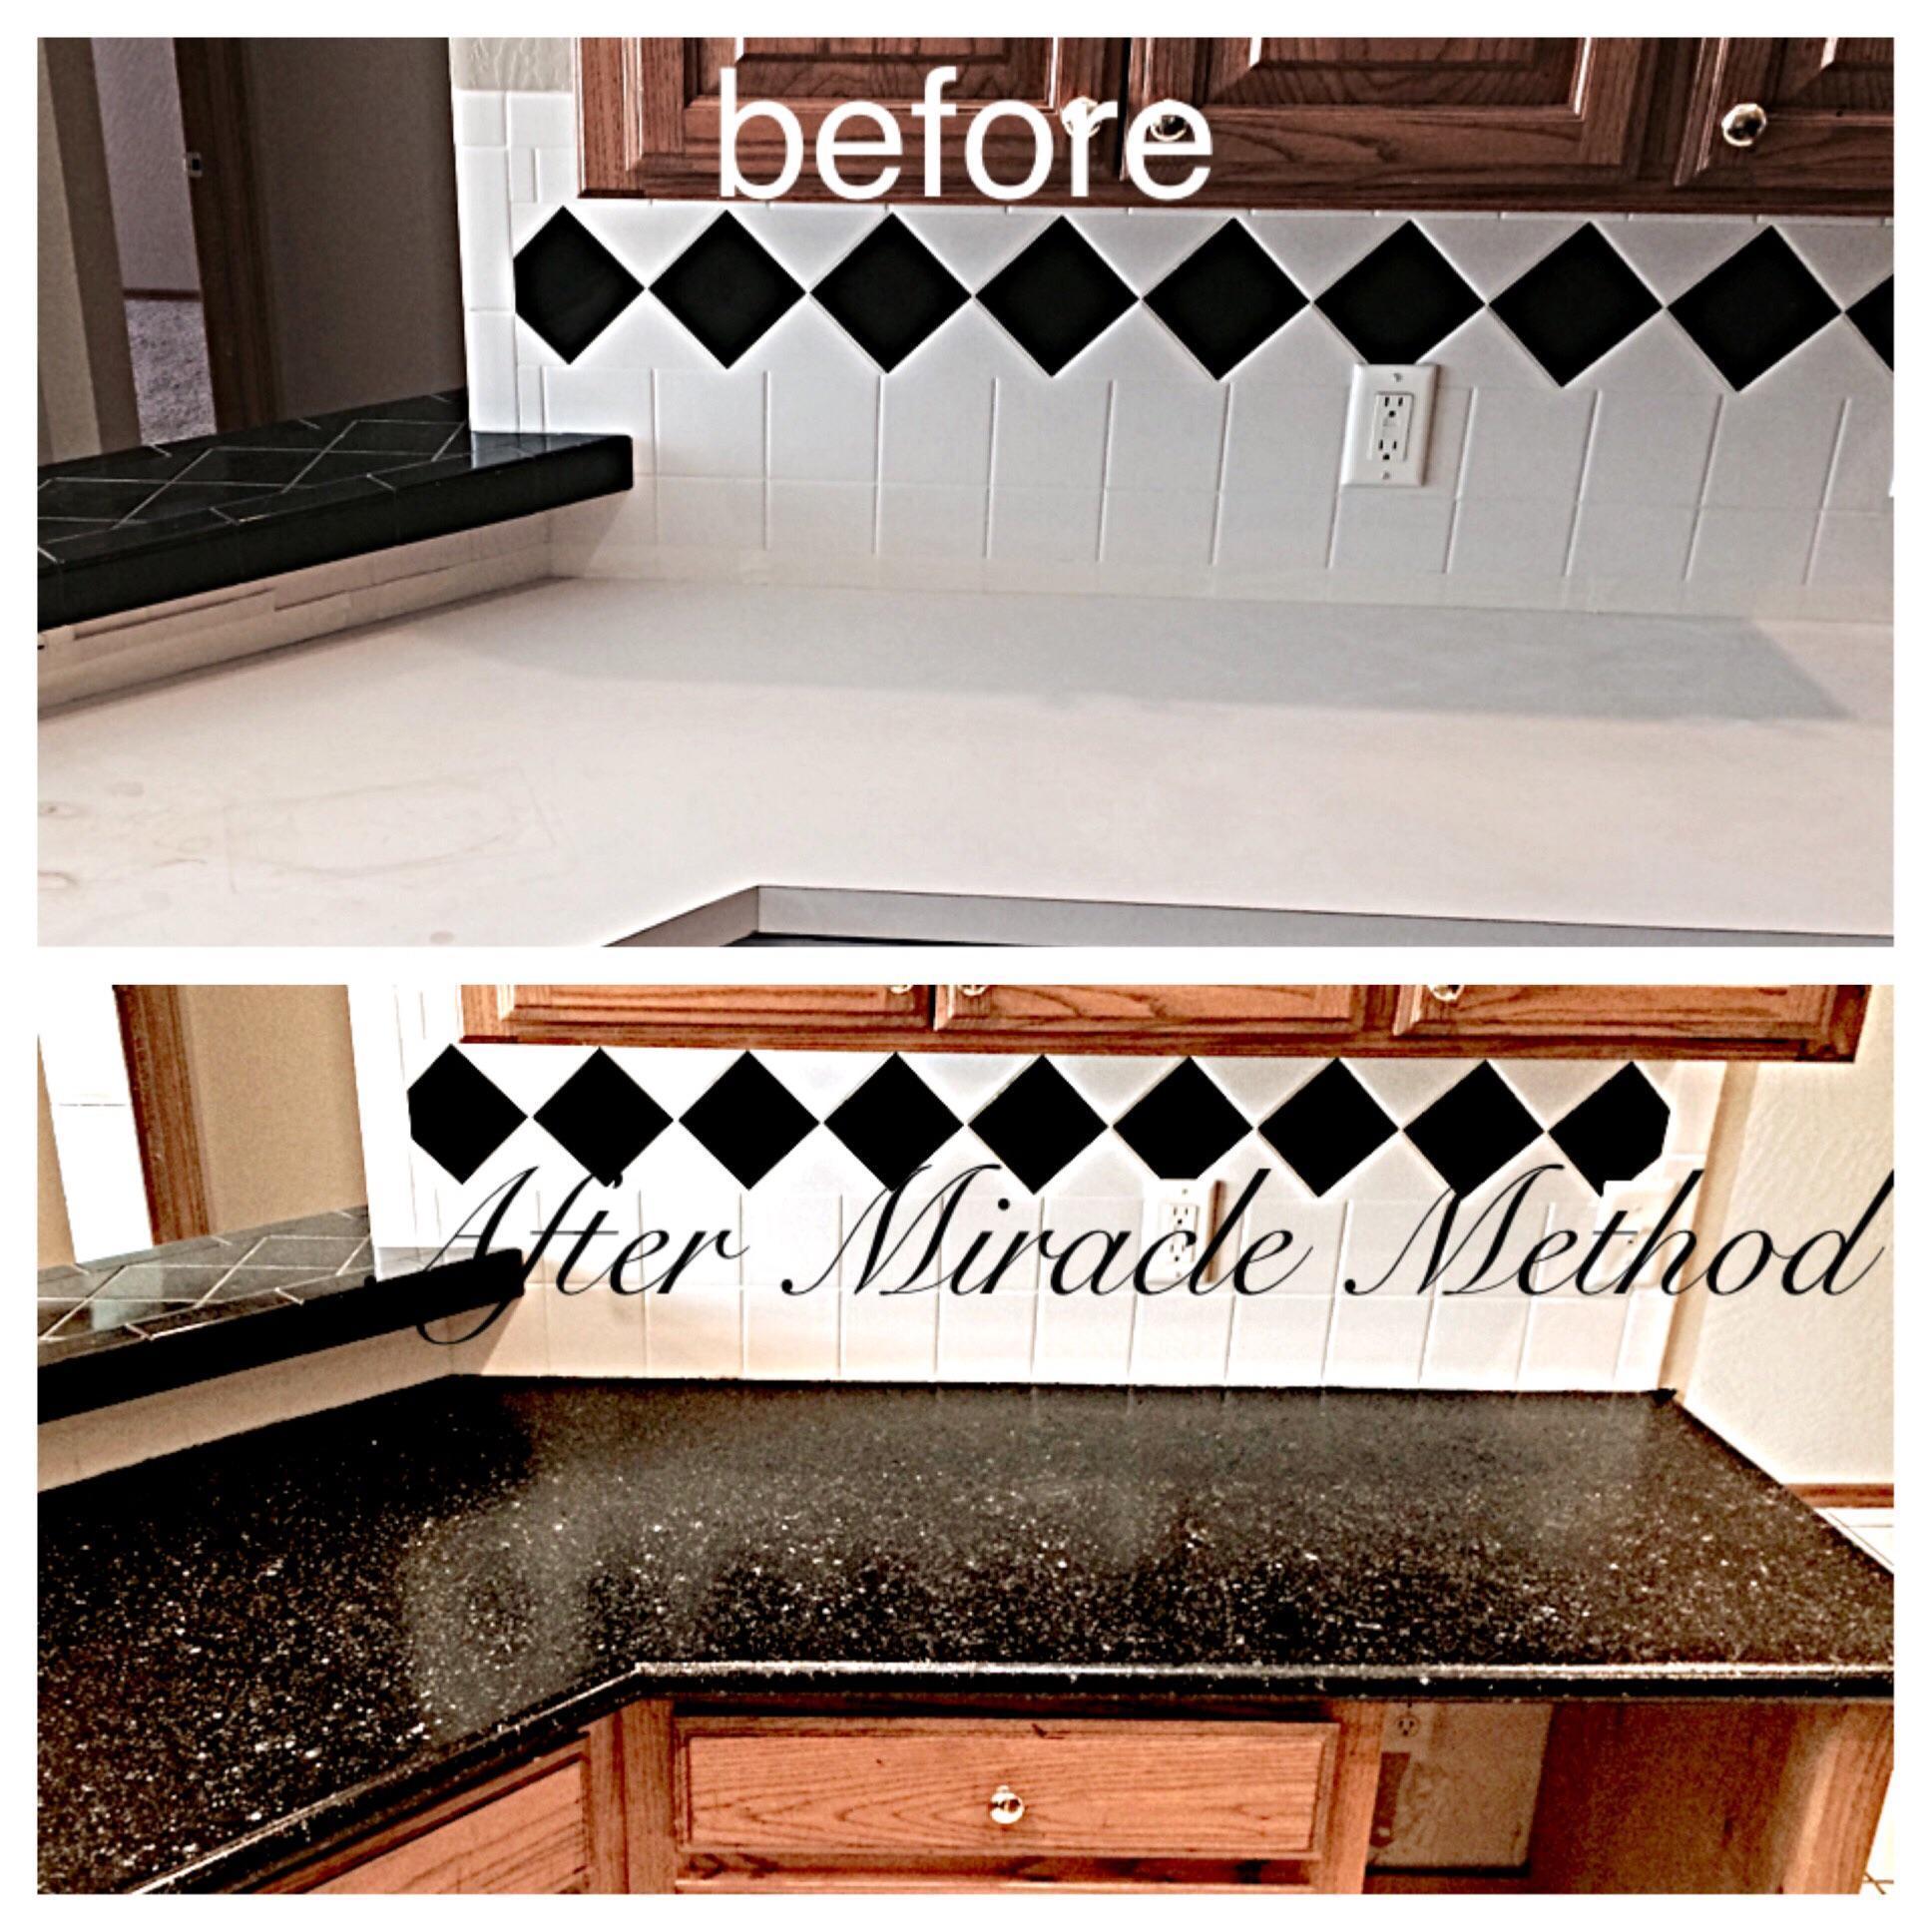 Miracle Method | Phone 405-562-6335 | Oklahoma city, OK, United States